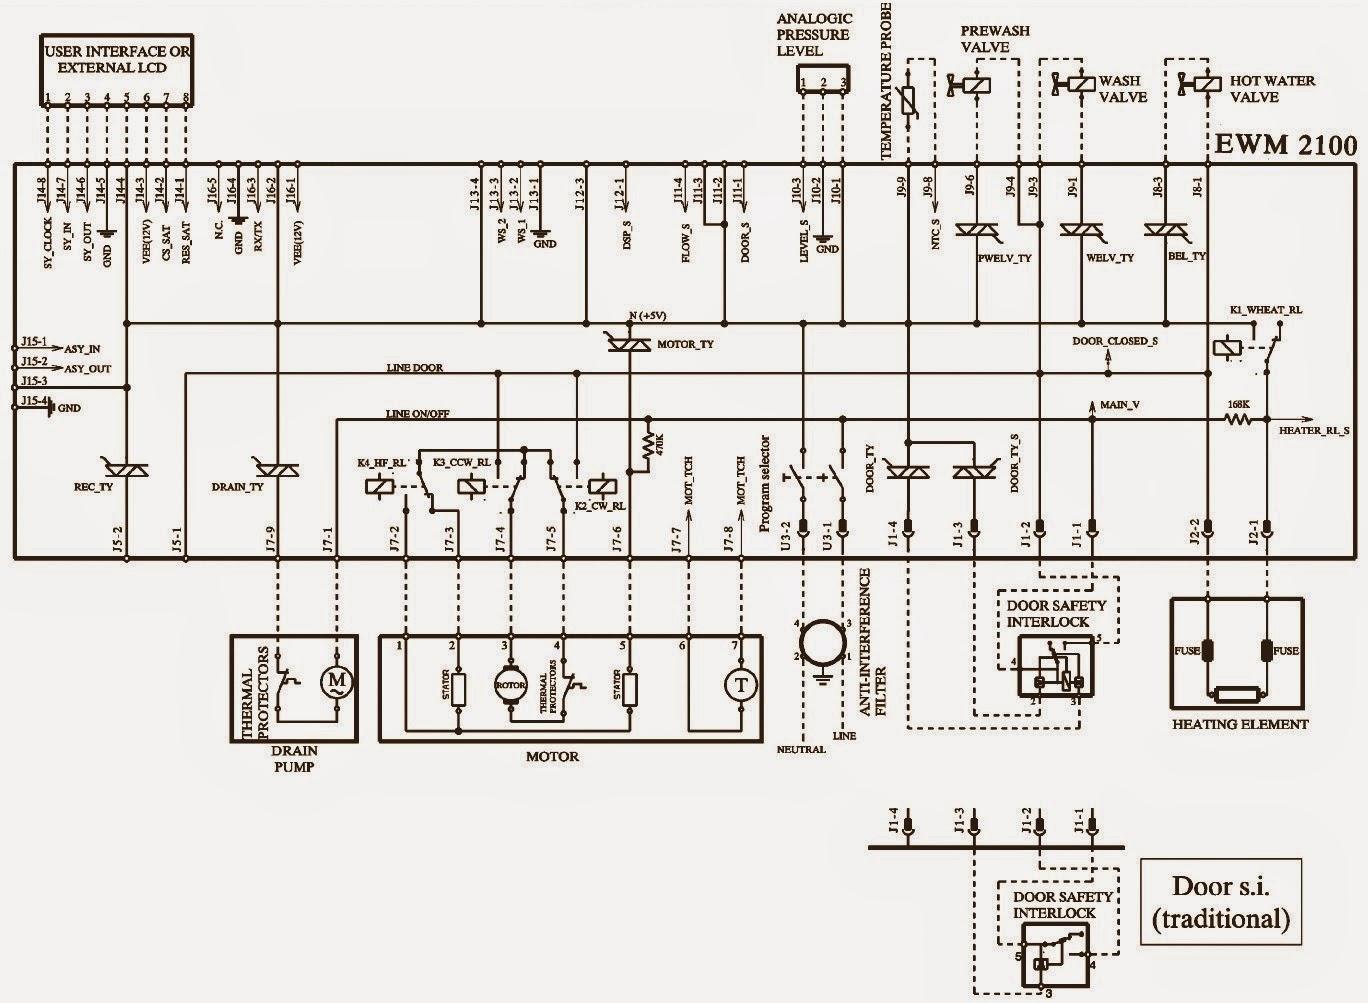 Electrolux Washing Machine Wiring Diagram - Www imagez co